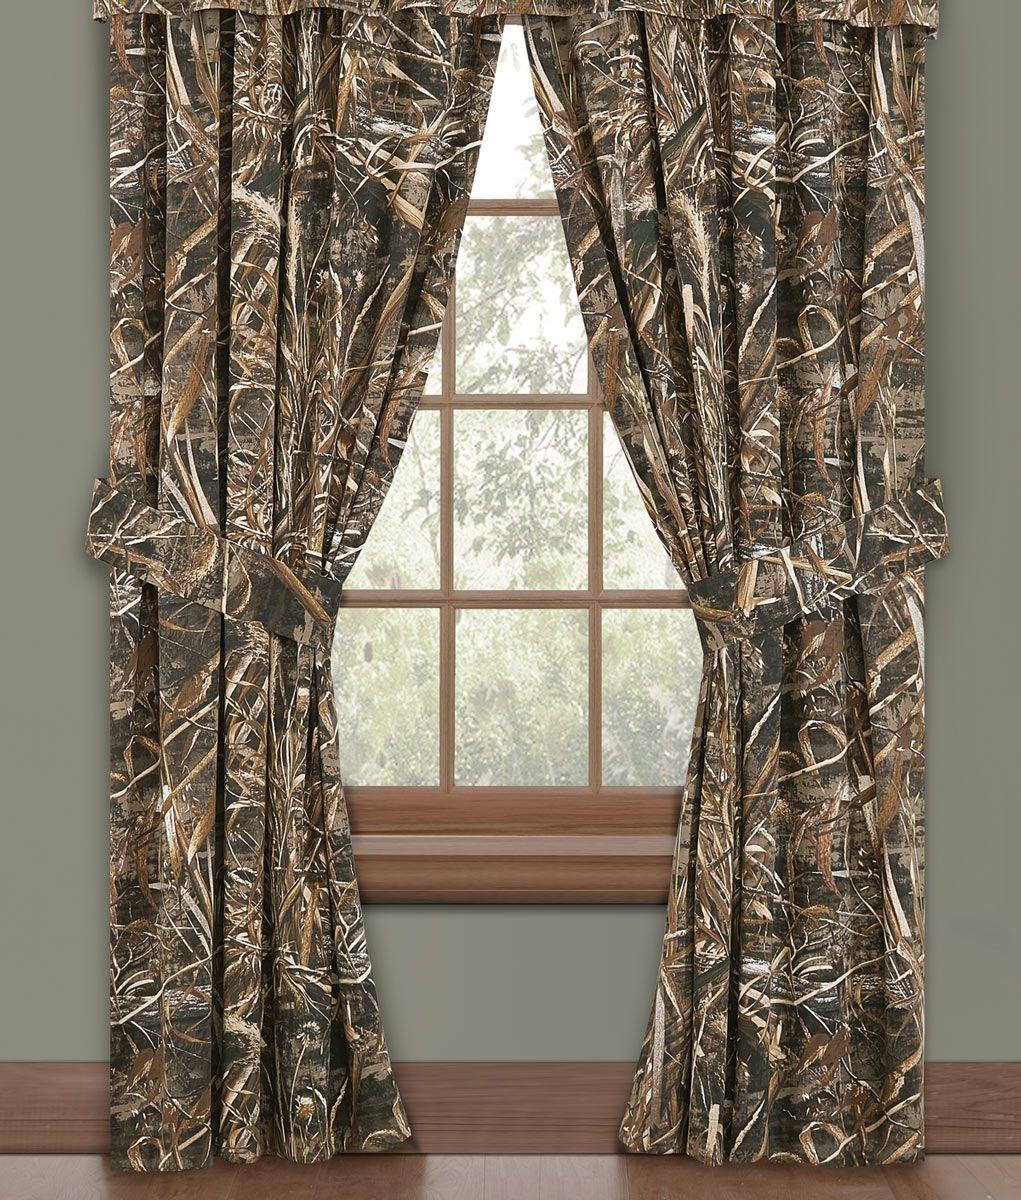 4 window curtain ideas  max  camo window curtains  realtagfo  pinterest